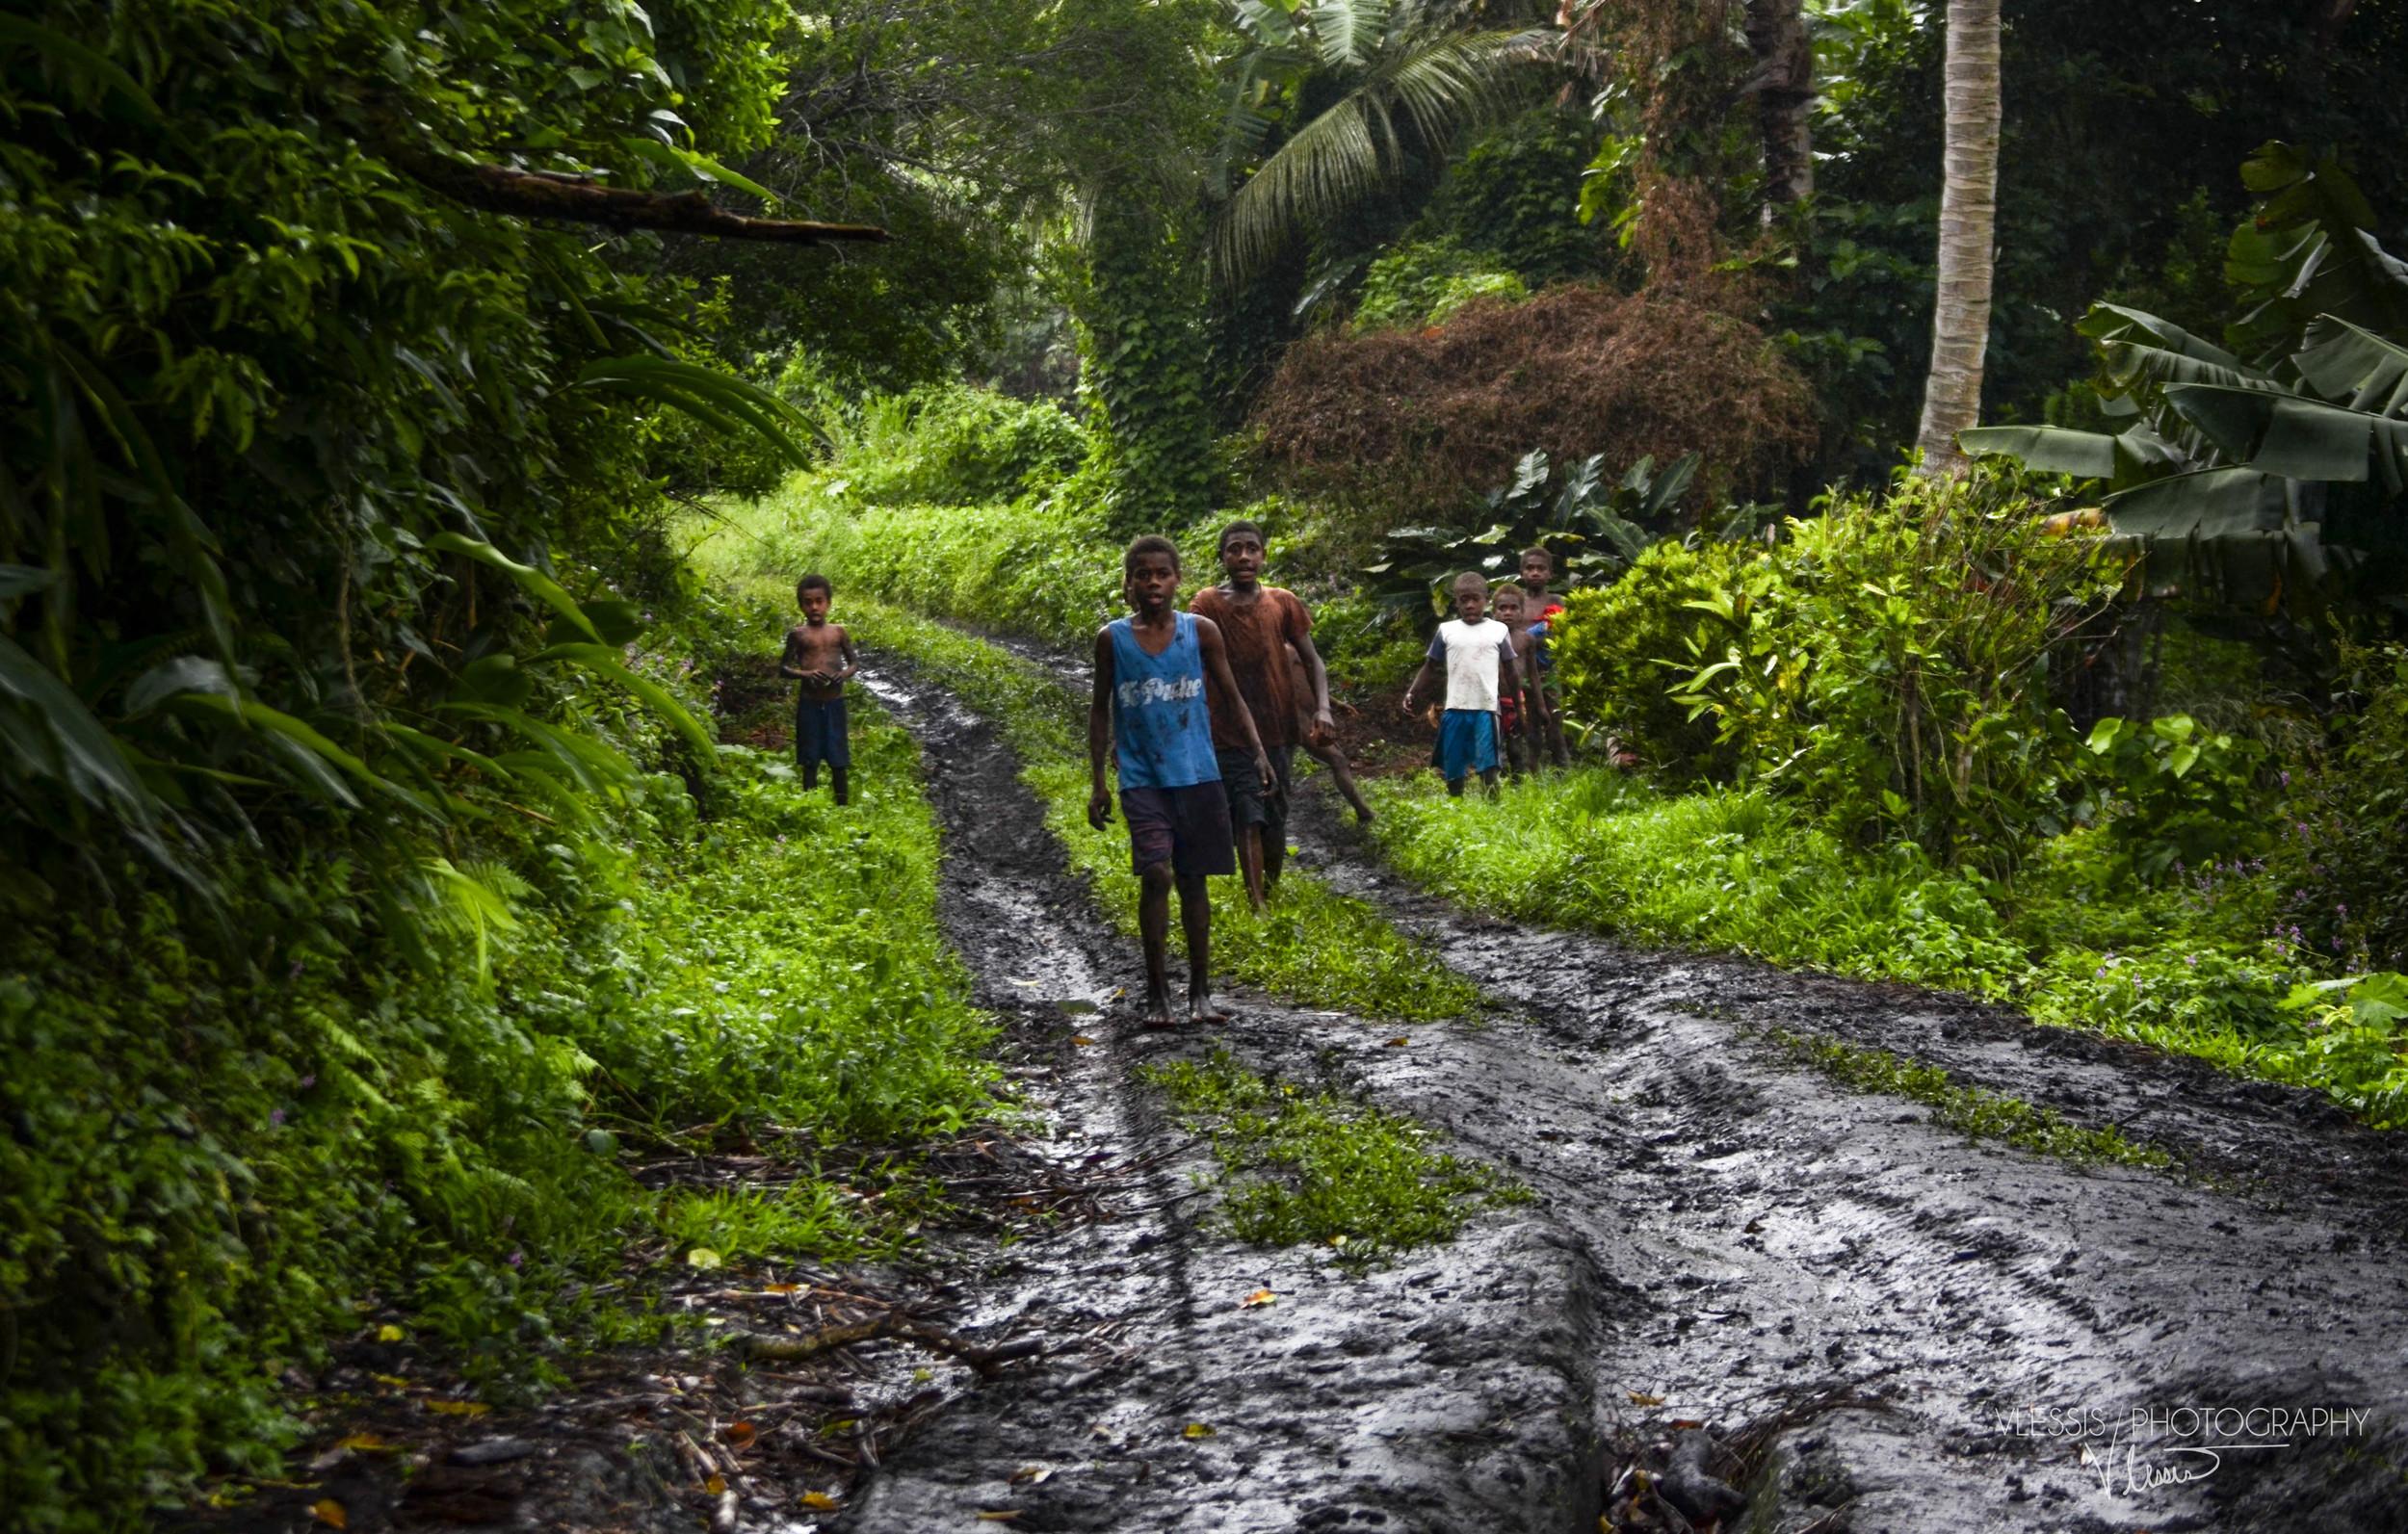 Vanuatujungle (1 of 1).jpg